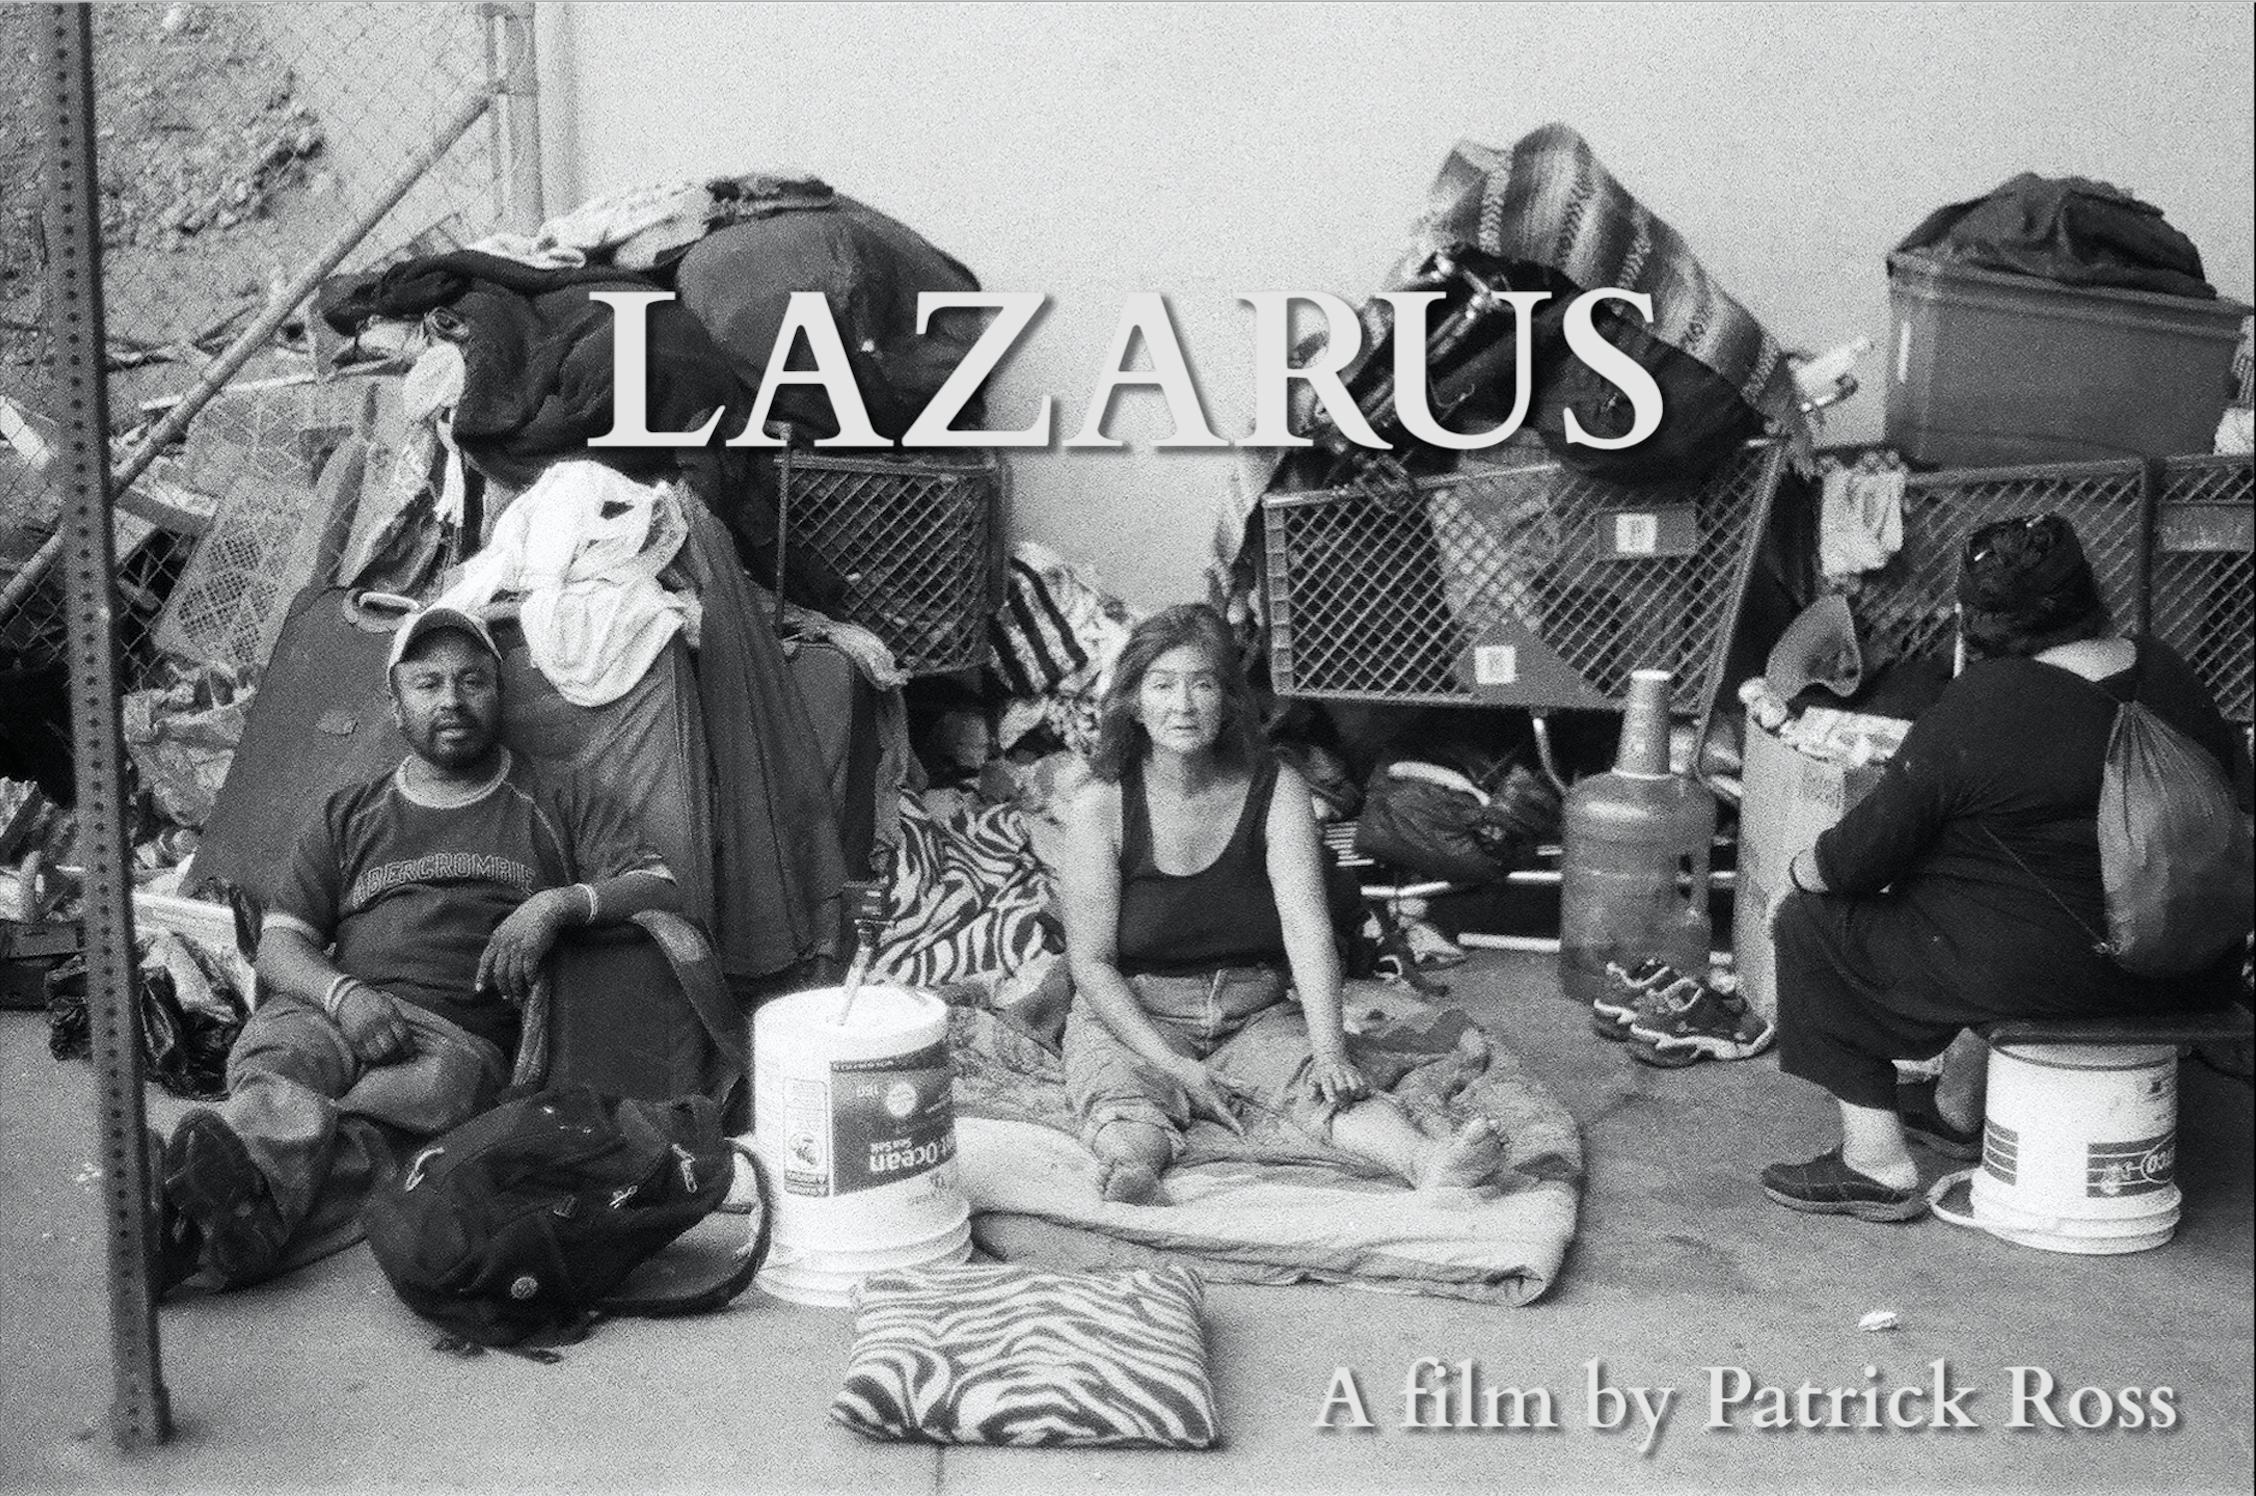 Lazarus – exhibit